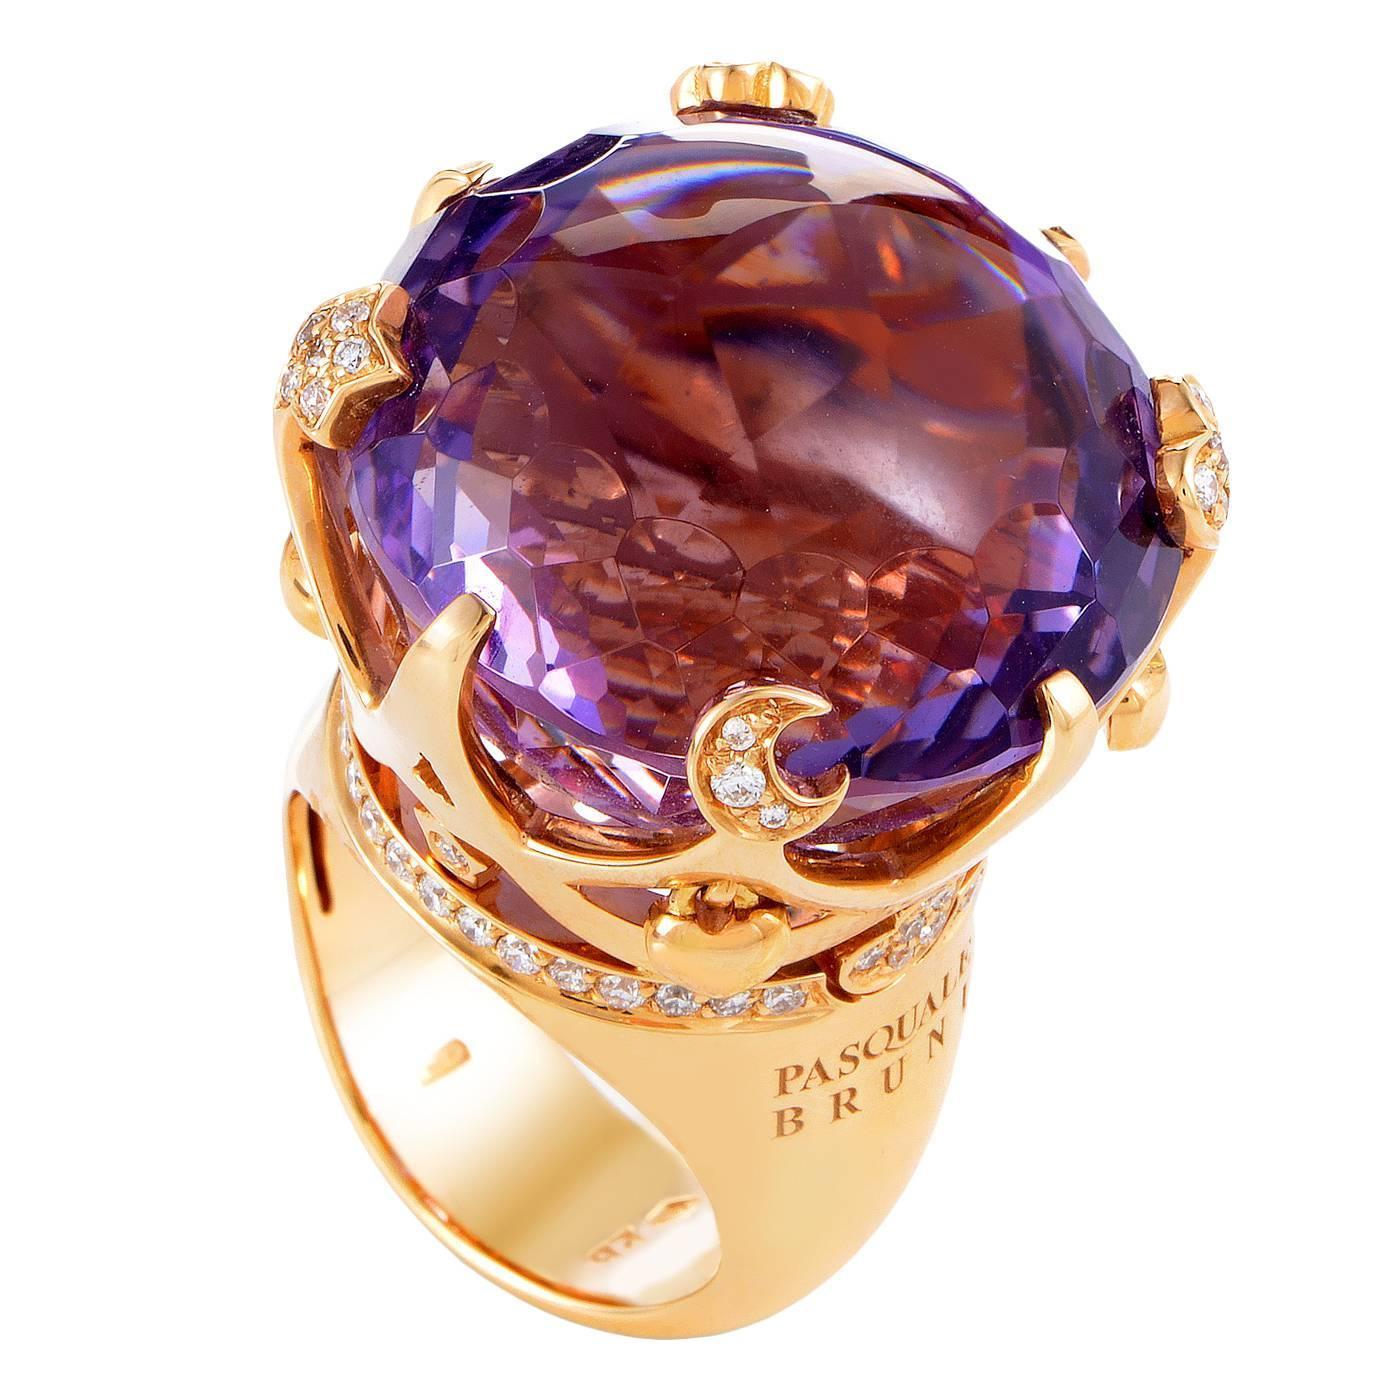 Pasquale Bruni Sissi Ring Price